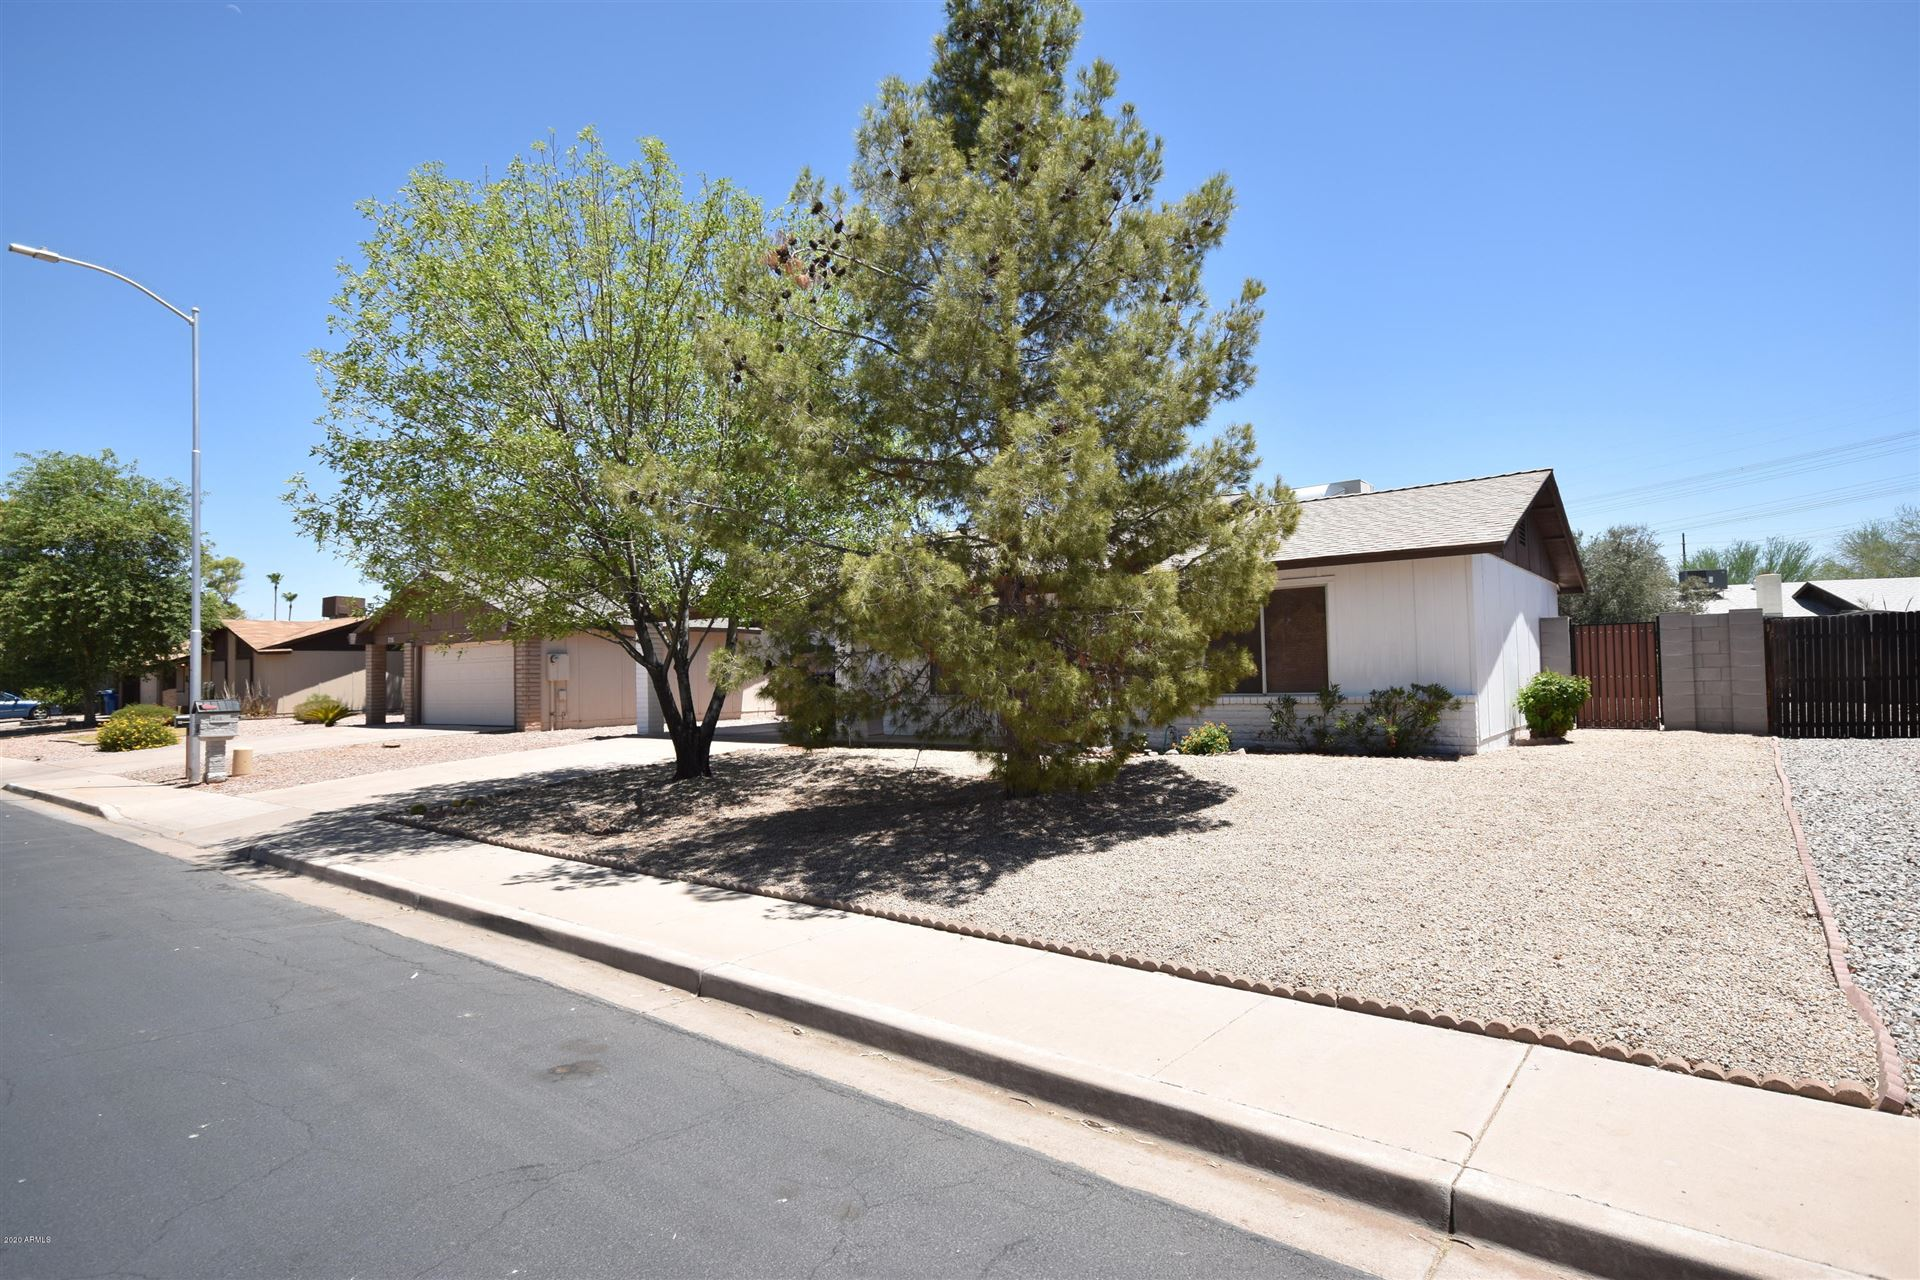 Photo of 723 W POSADA Avenue, Mesa, AZ 85210 (MLS # 6231233)